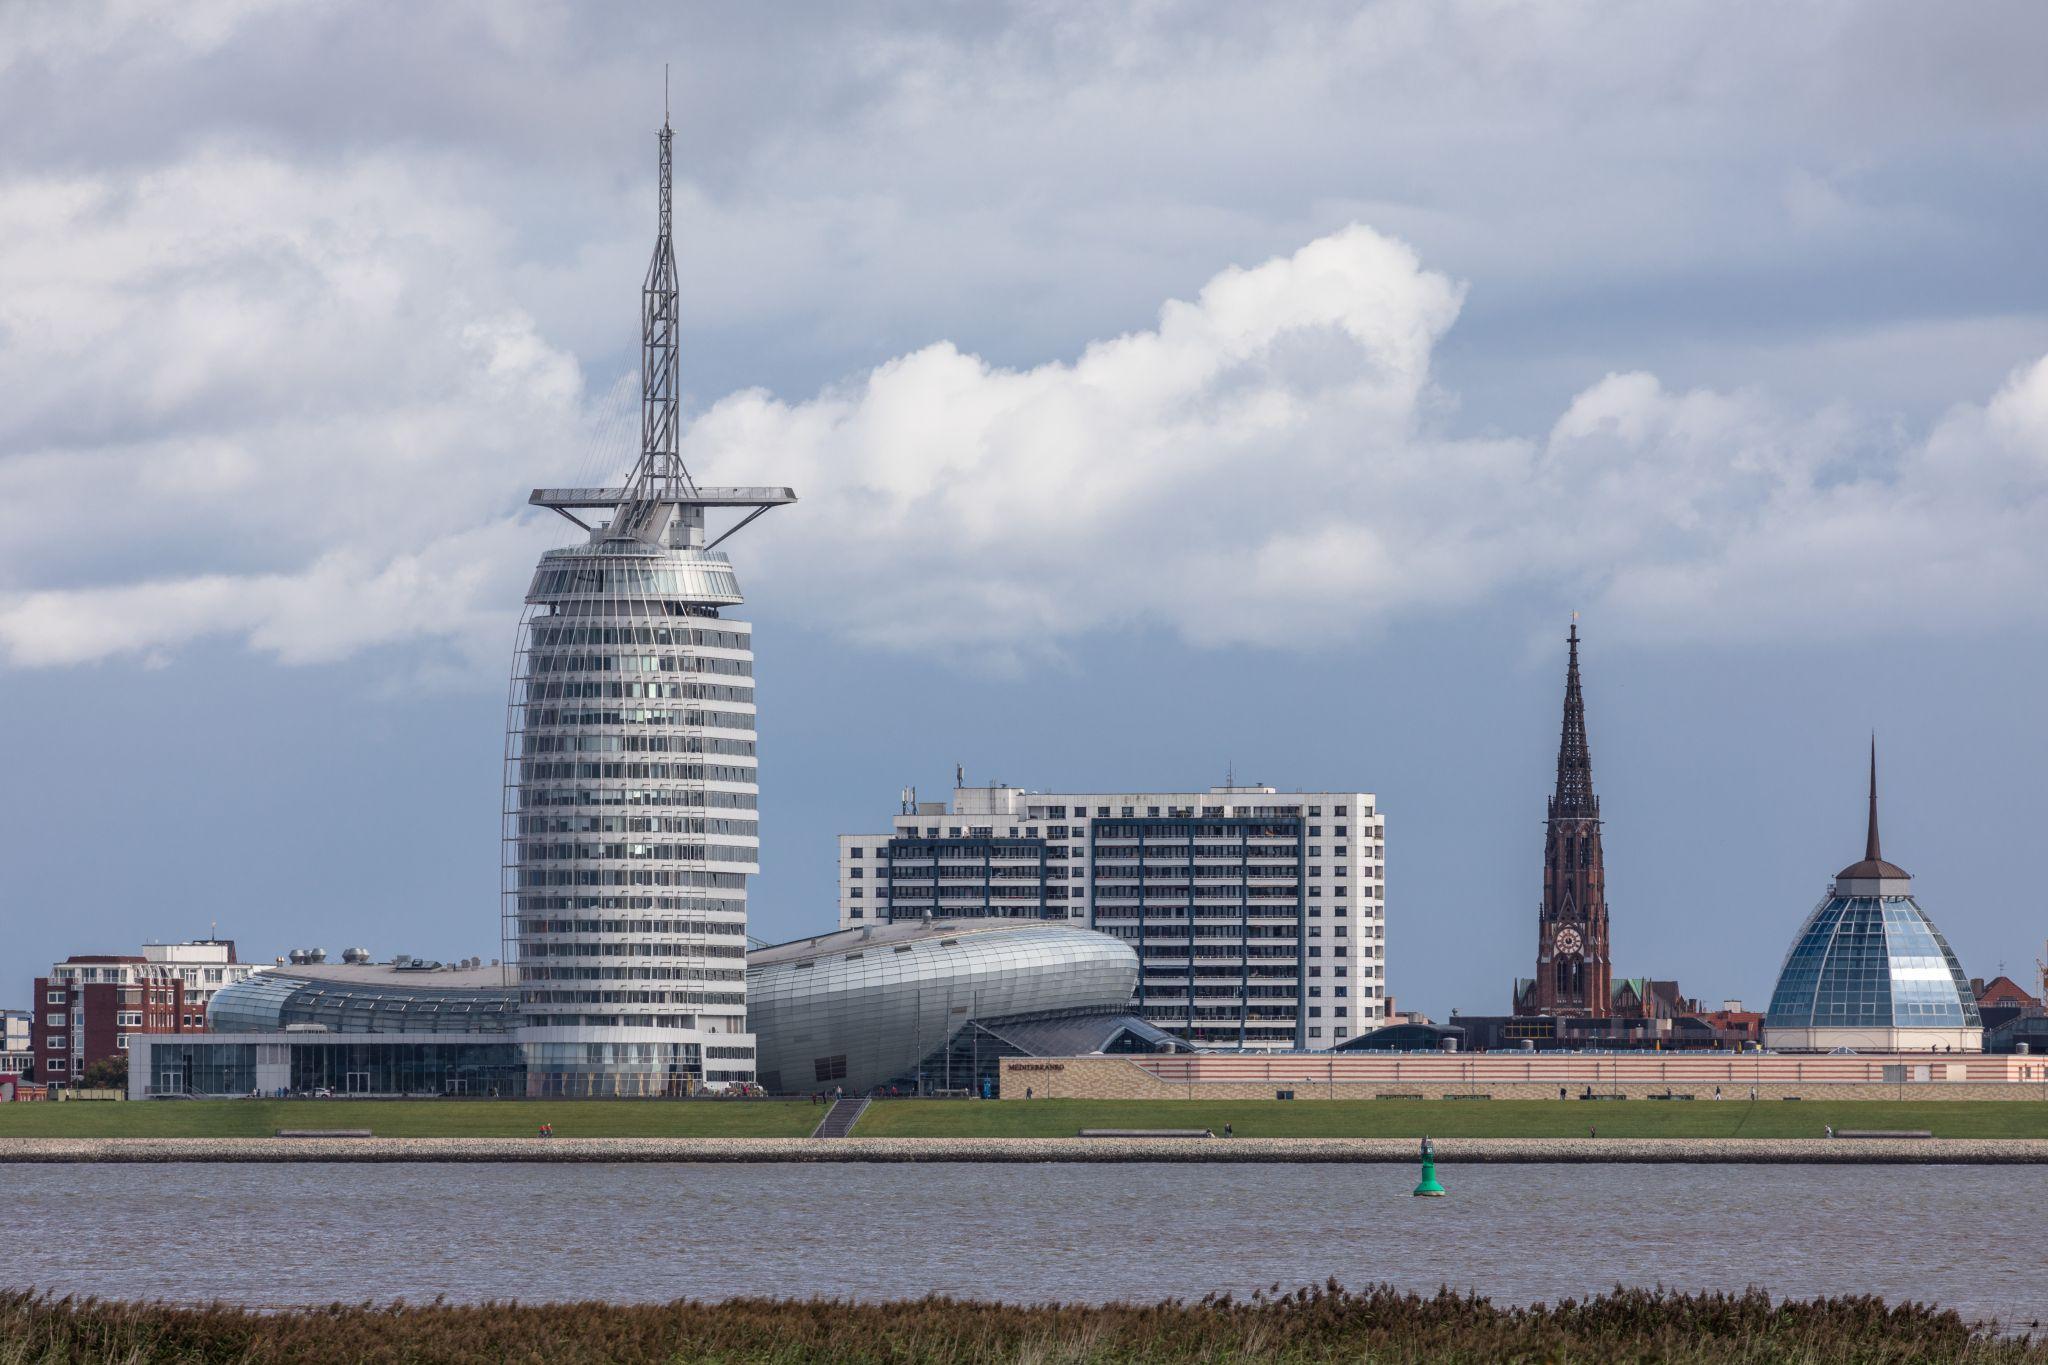 Havenwelten Bremerhaven, Germany